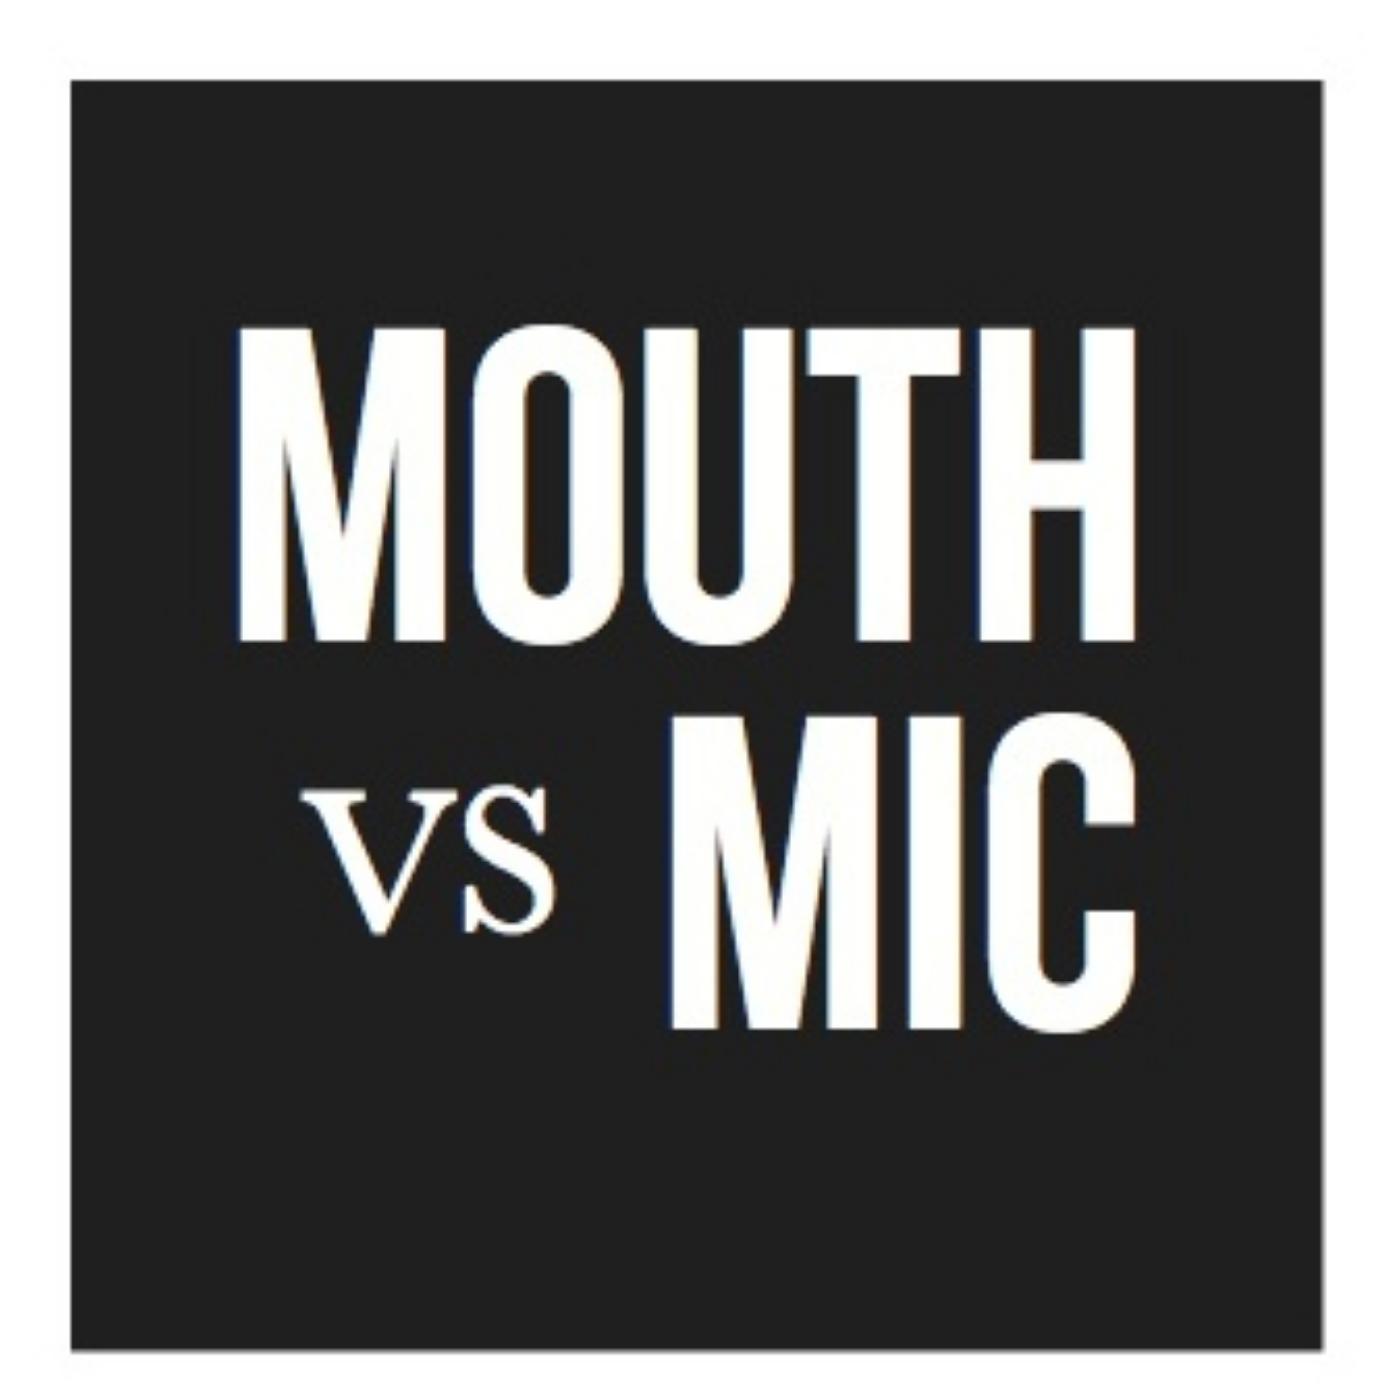 Mouth Vs Mic Podcast - Mouth Vs Mic